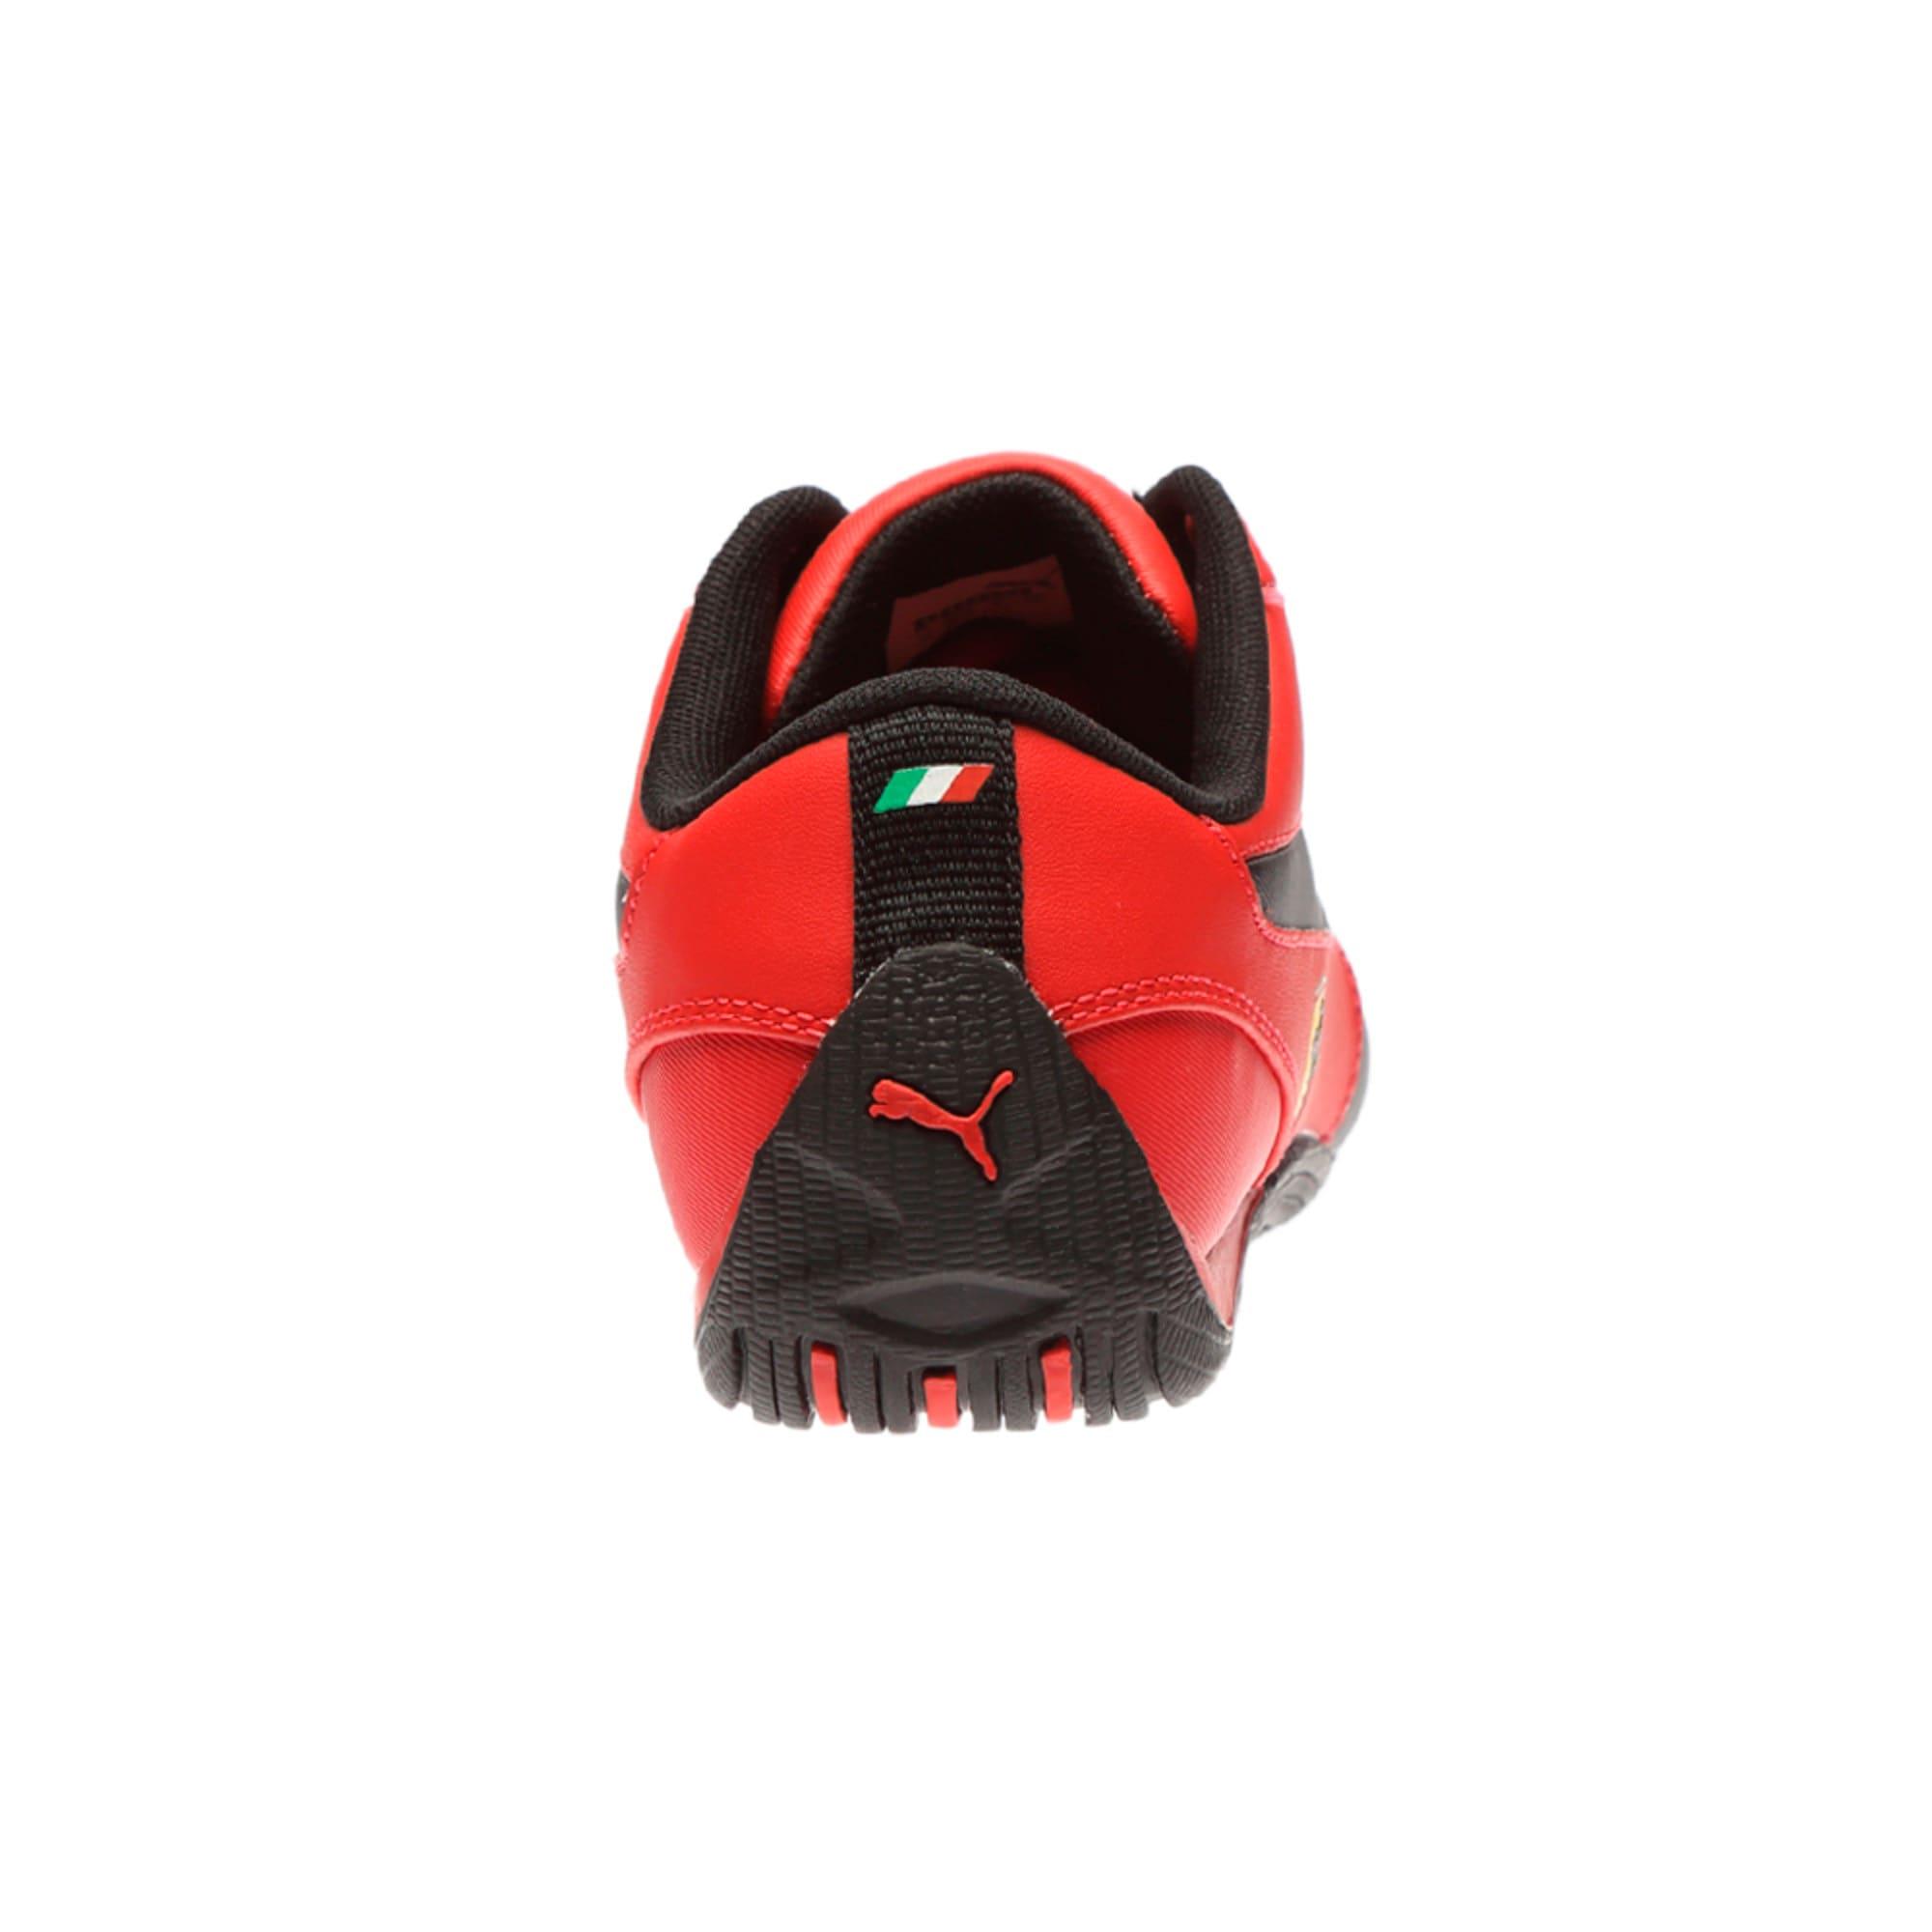 Thumbnail 4 of Ferrari Drift Cat 5 Jr. Trainers, Rosso Corsa-Puma Black, medium-IND